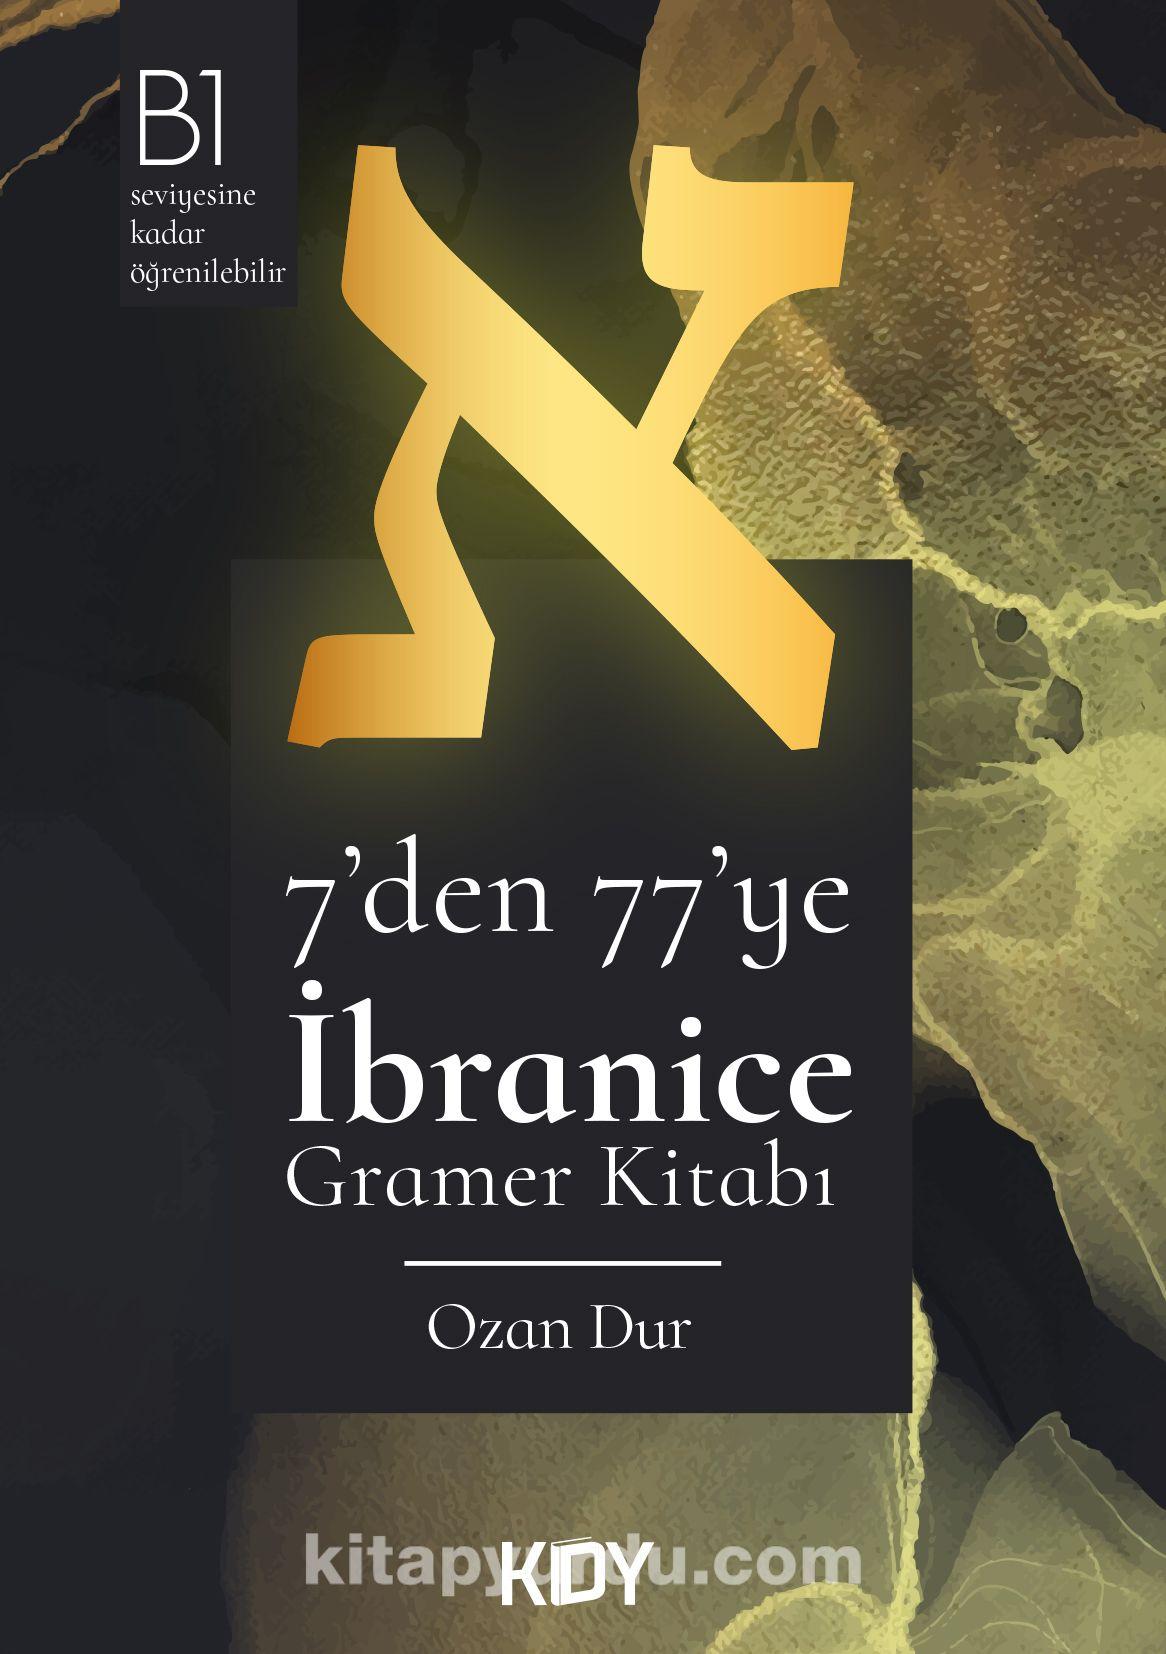 İbranice Gramer Kitabı  PDF Kitap İndir